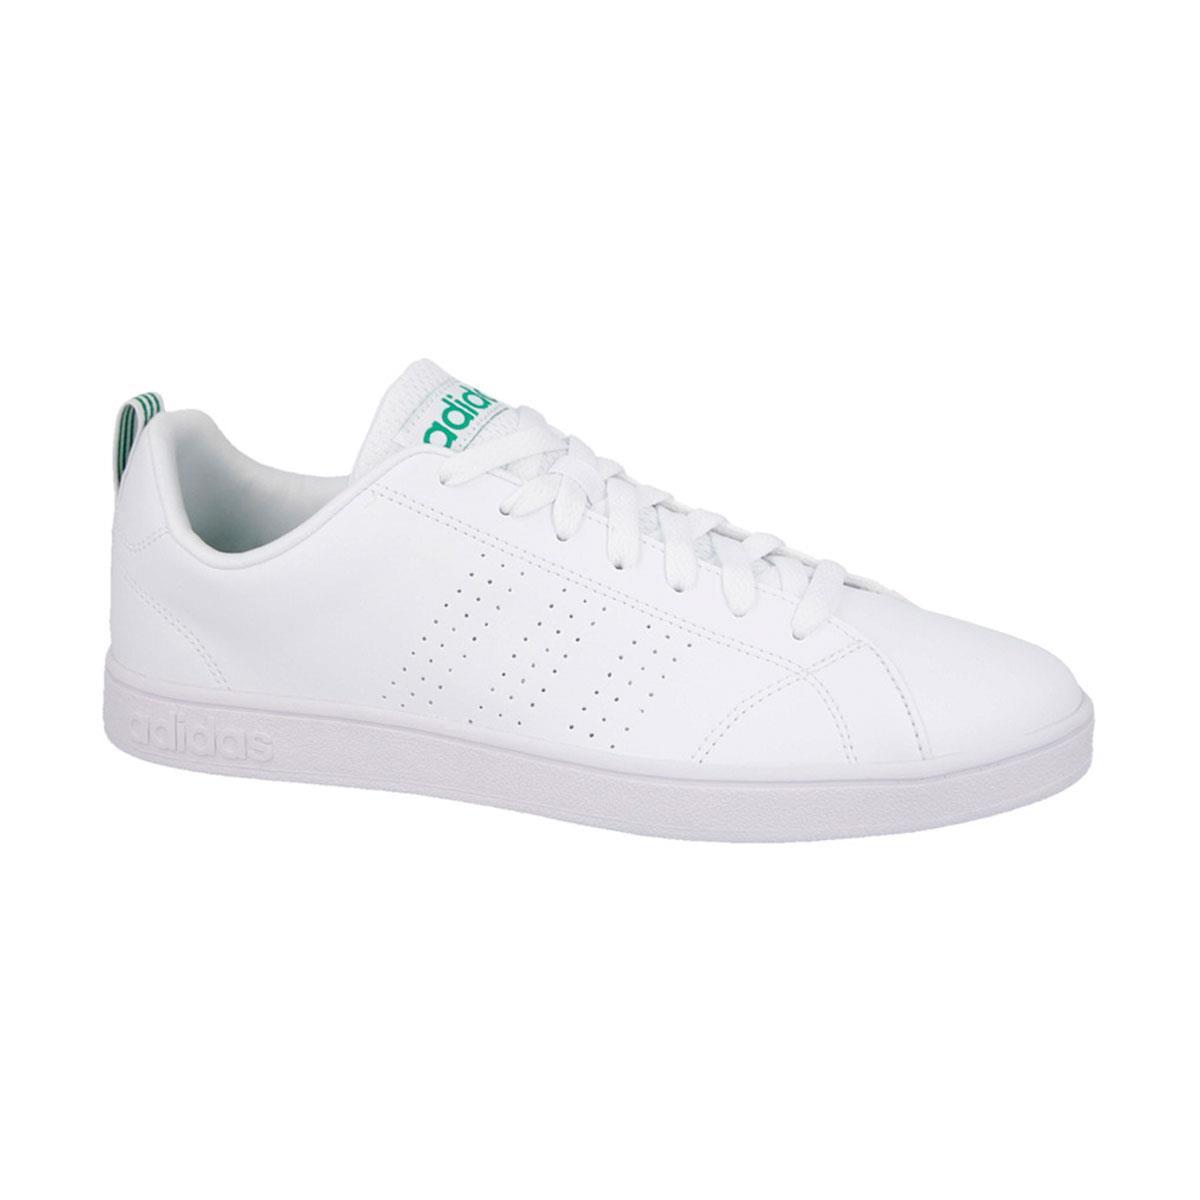 b26547552 Tênis Adidas Neo Advantage Clean Infantil